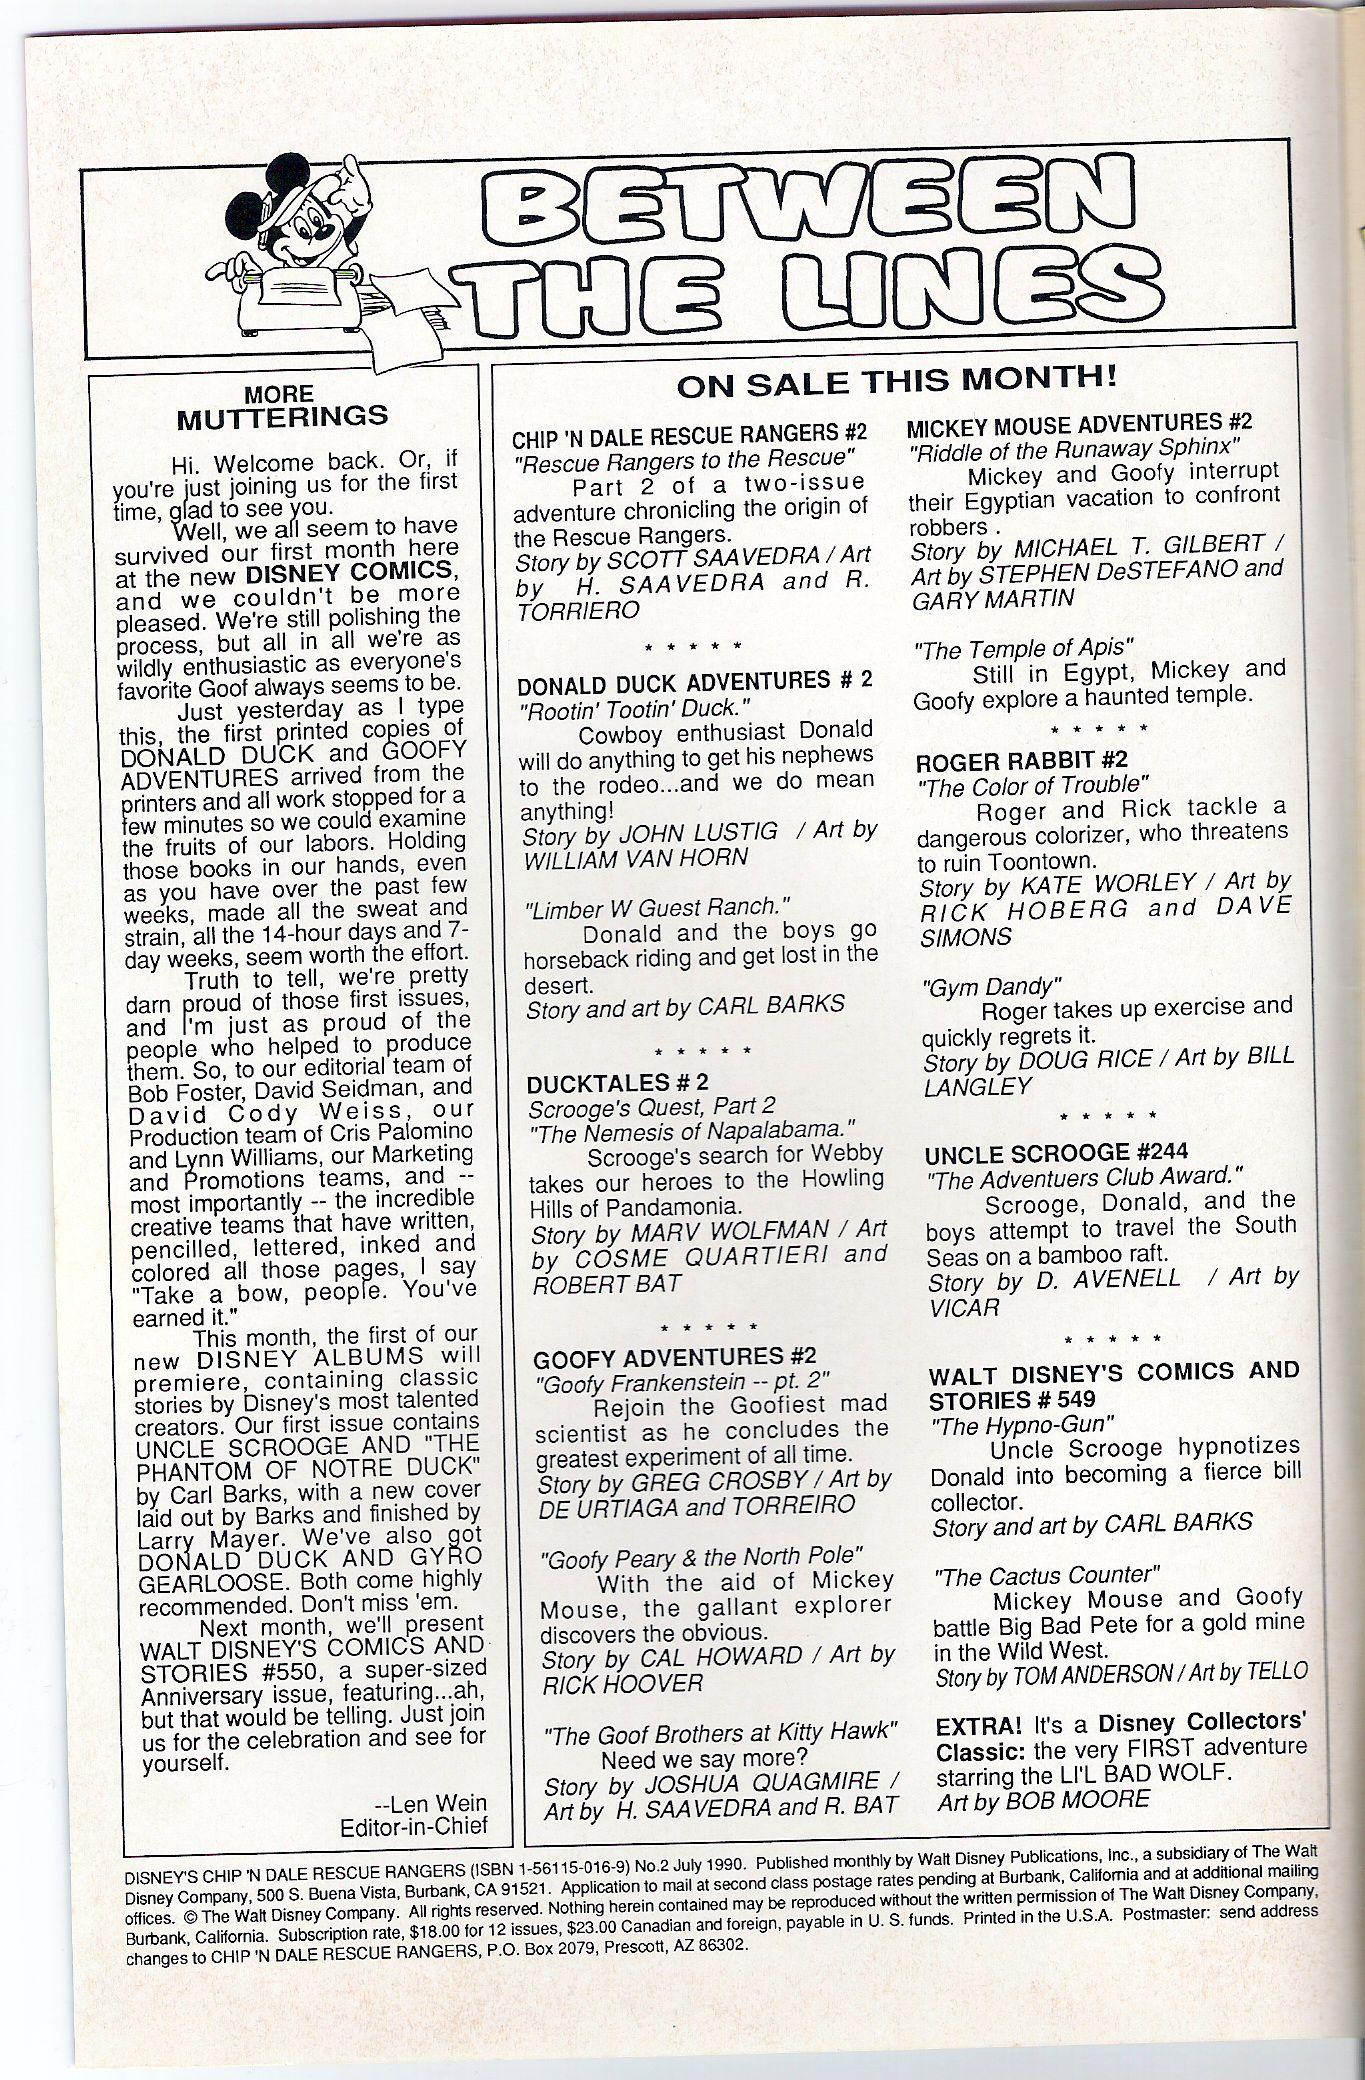 Disneys Chip N Dale Rescue Rangers 2 Page 2